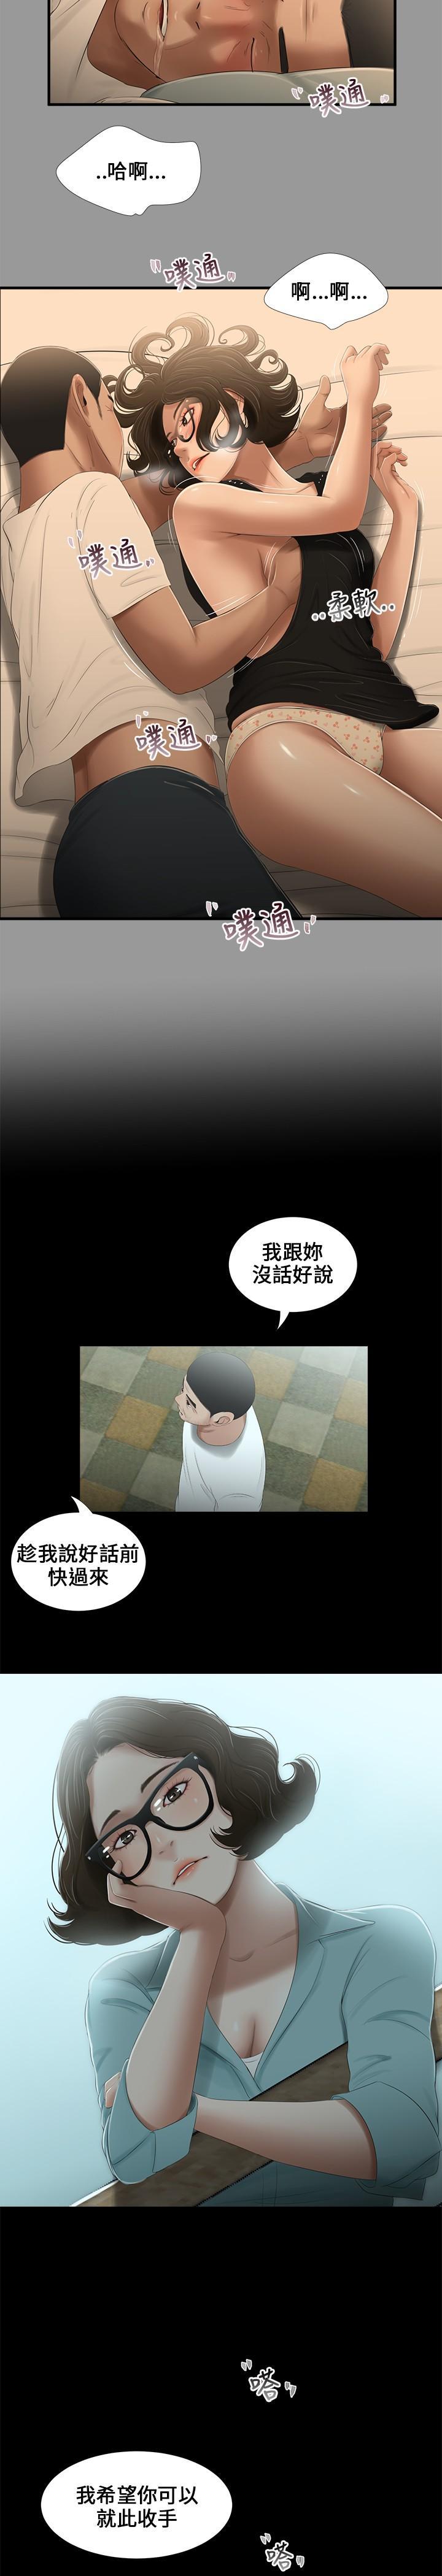 Three sisters 三姐妹Ch.13~19 (Chinese)中文 53